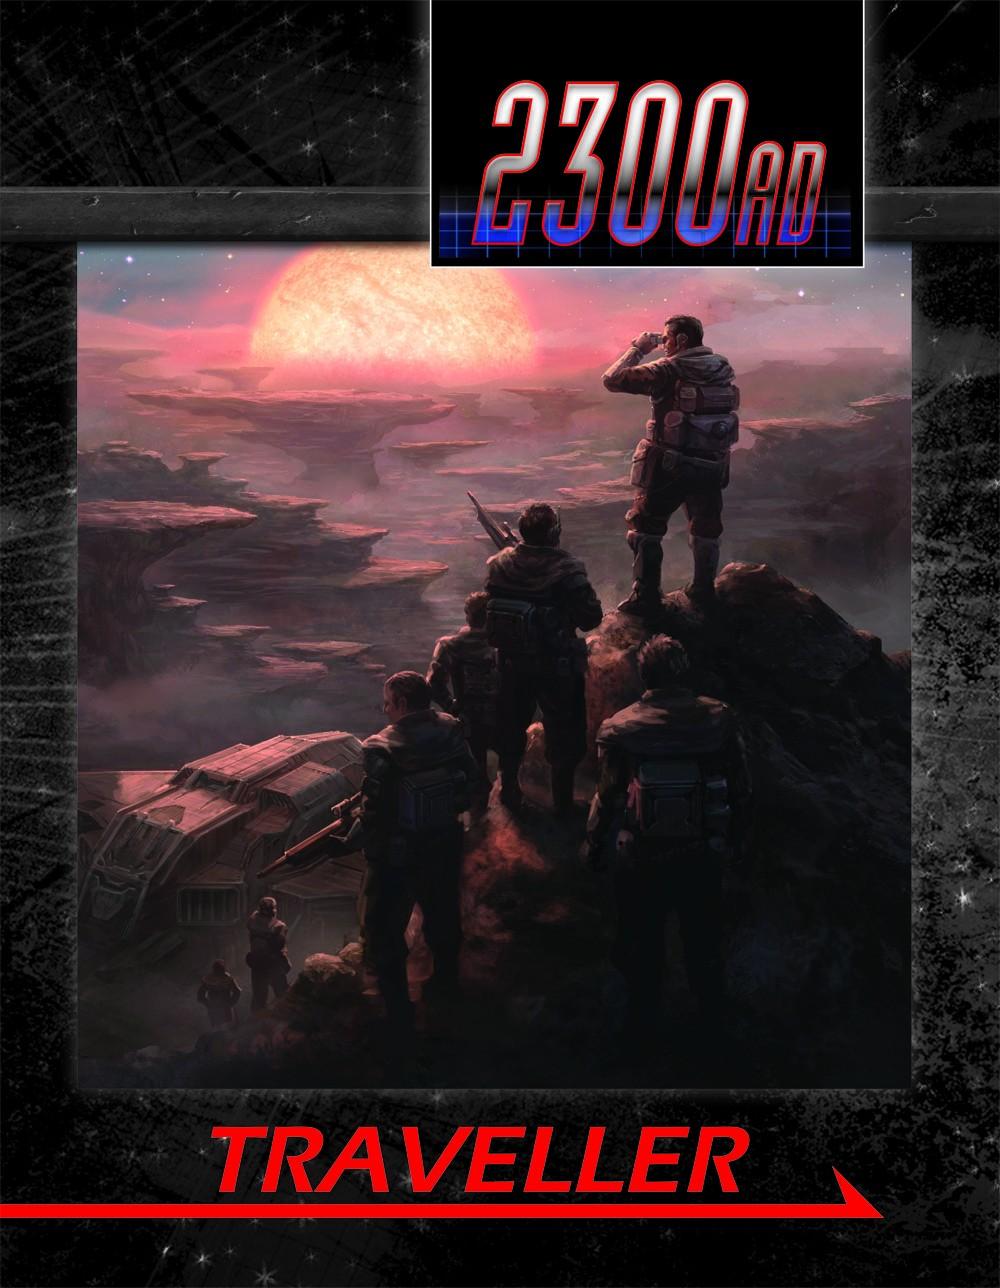 traveller pdf